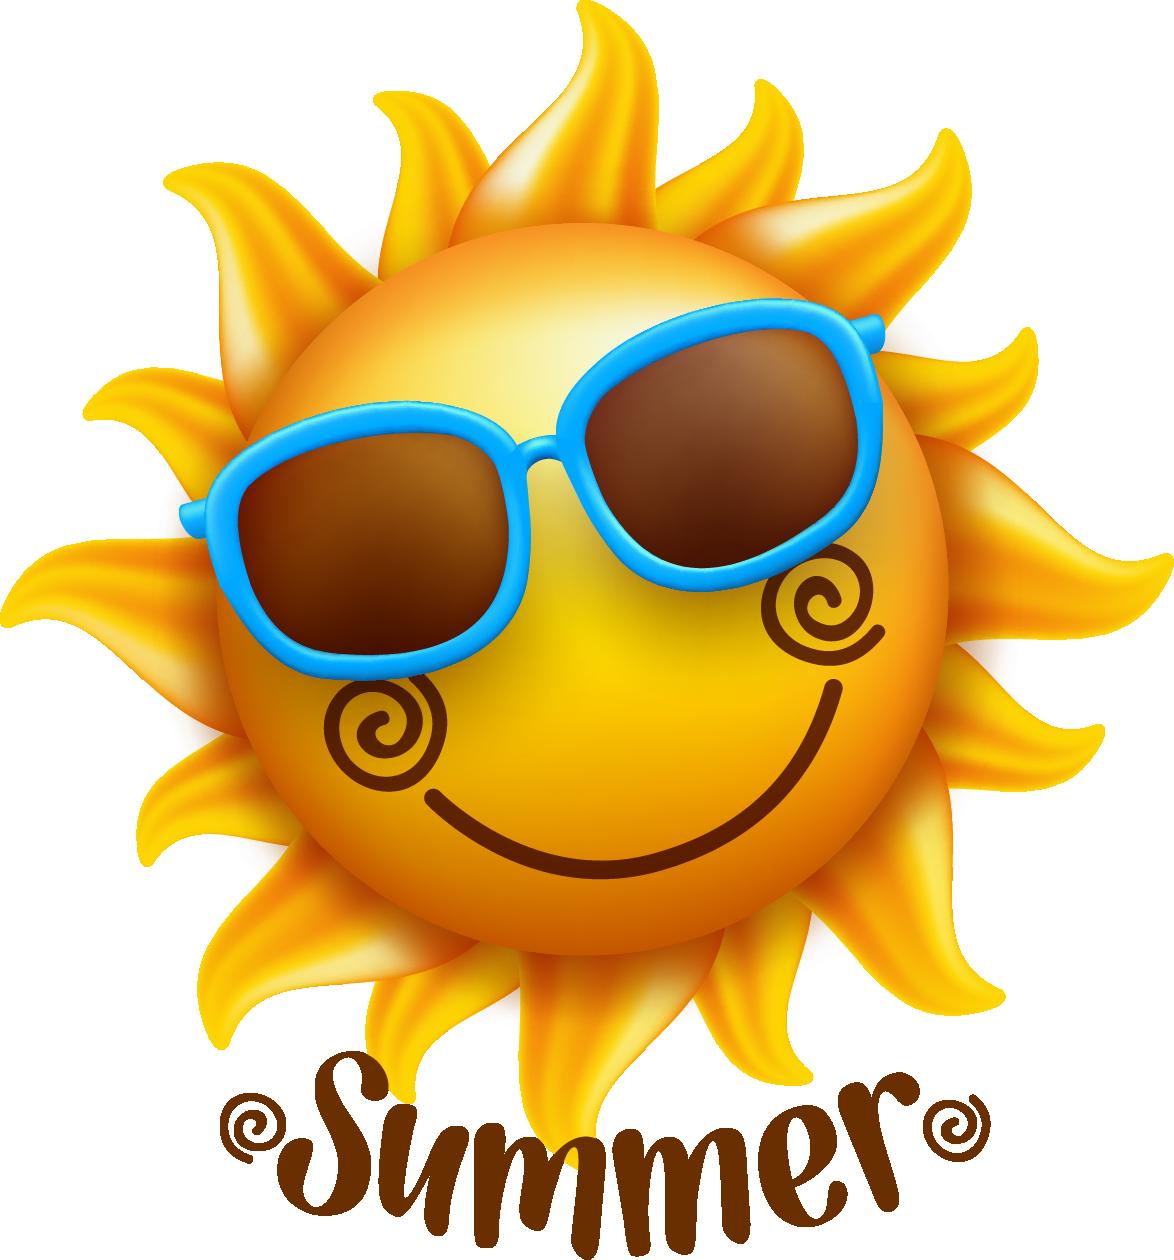 Summer sun clipart vector free download Smiley Face Illustration - Summer sun 1174*1260 transprent Png Free ... vector free download